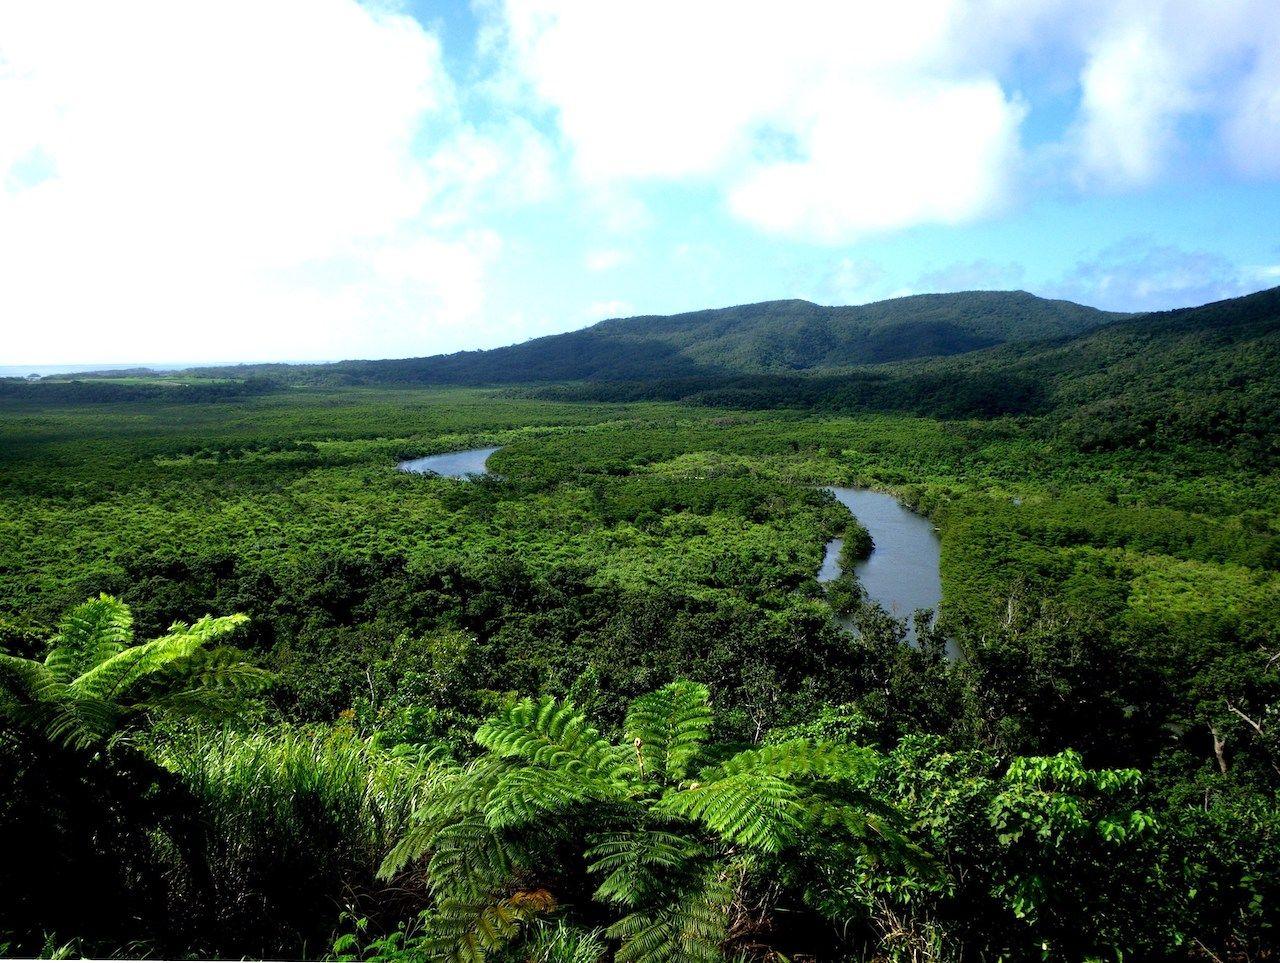 Amami-Oshima Island, Tokunoshima Island, Northern part of Okinawa Island, and Iriomote Island, Japan